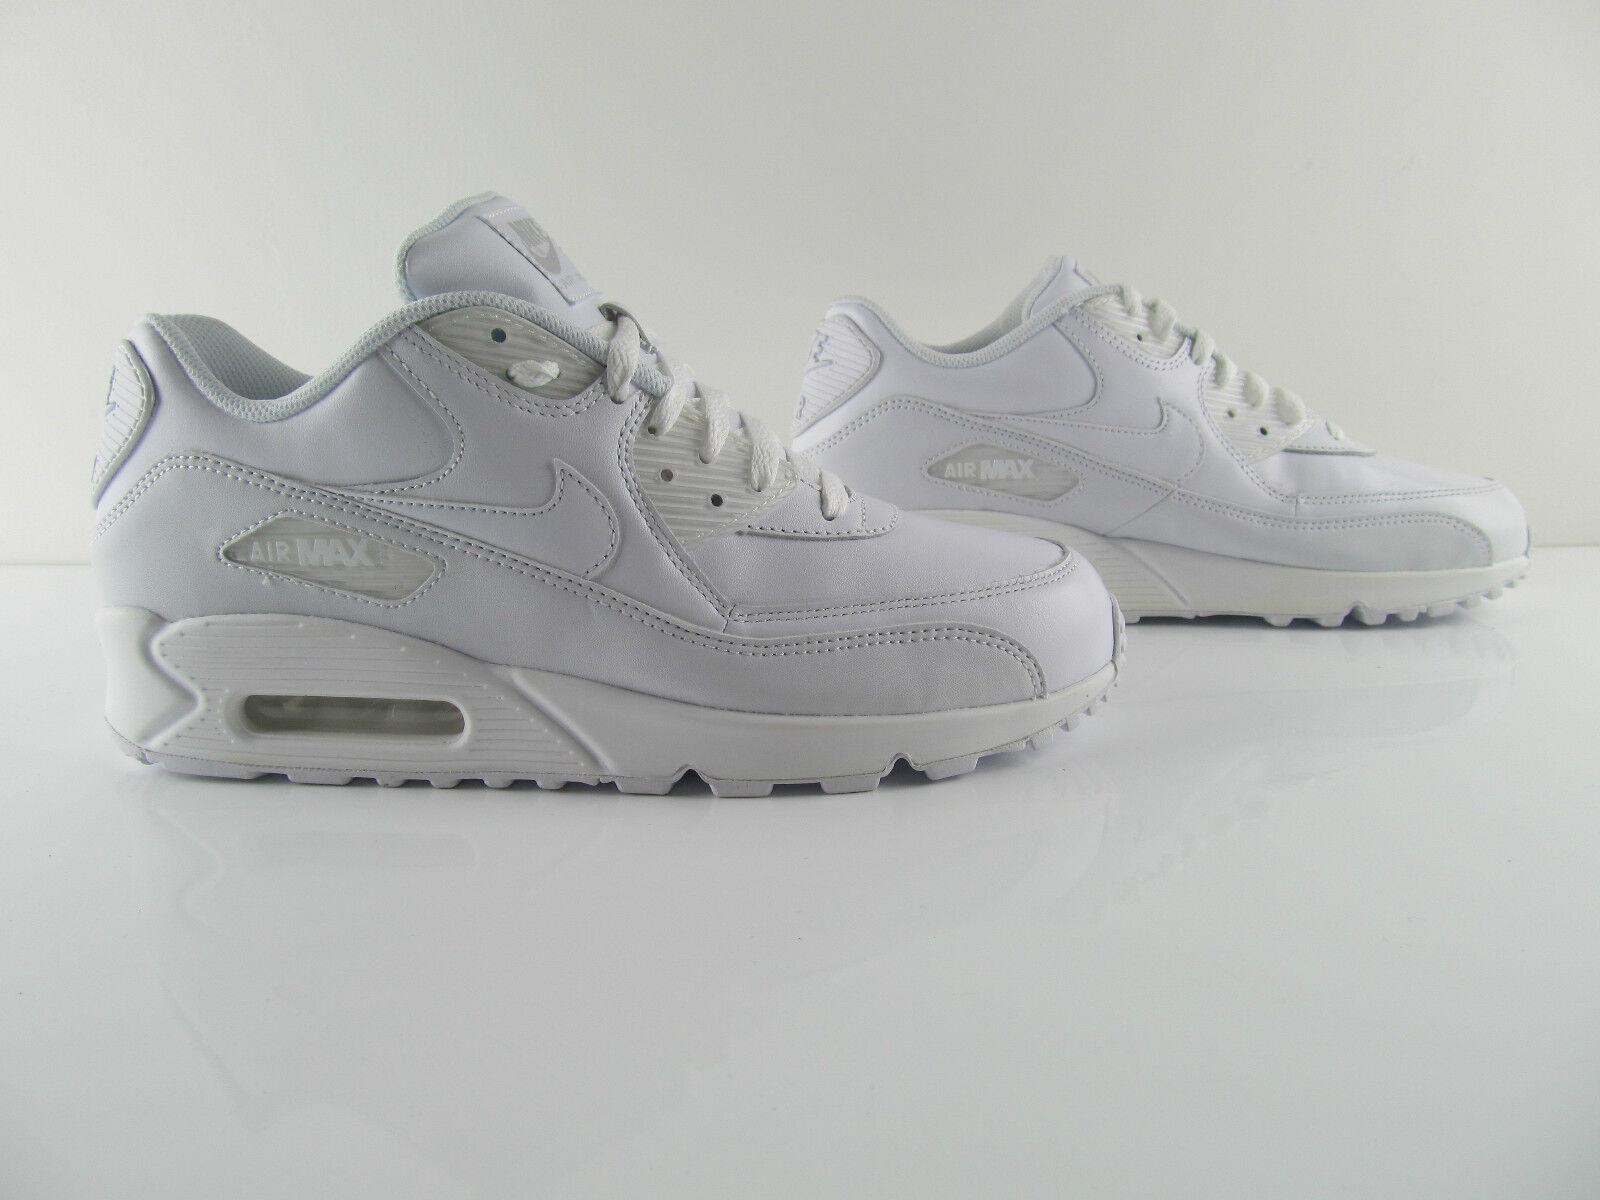 Nike Air Max 90 Essential 87 1 Triple US_10 All White UK_9 US_10 Triple Eur 44 64950d